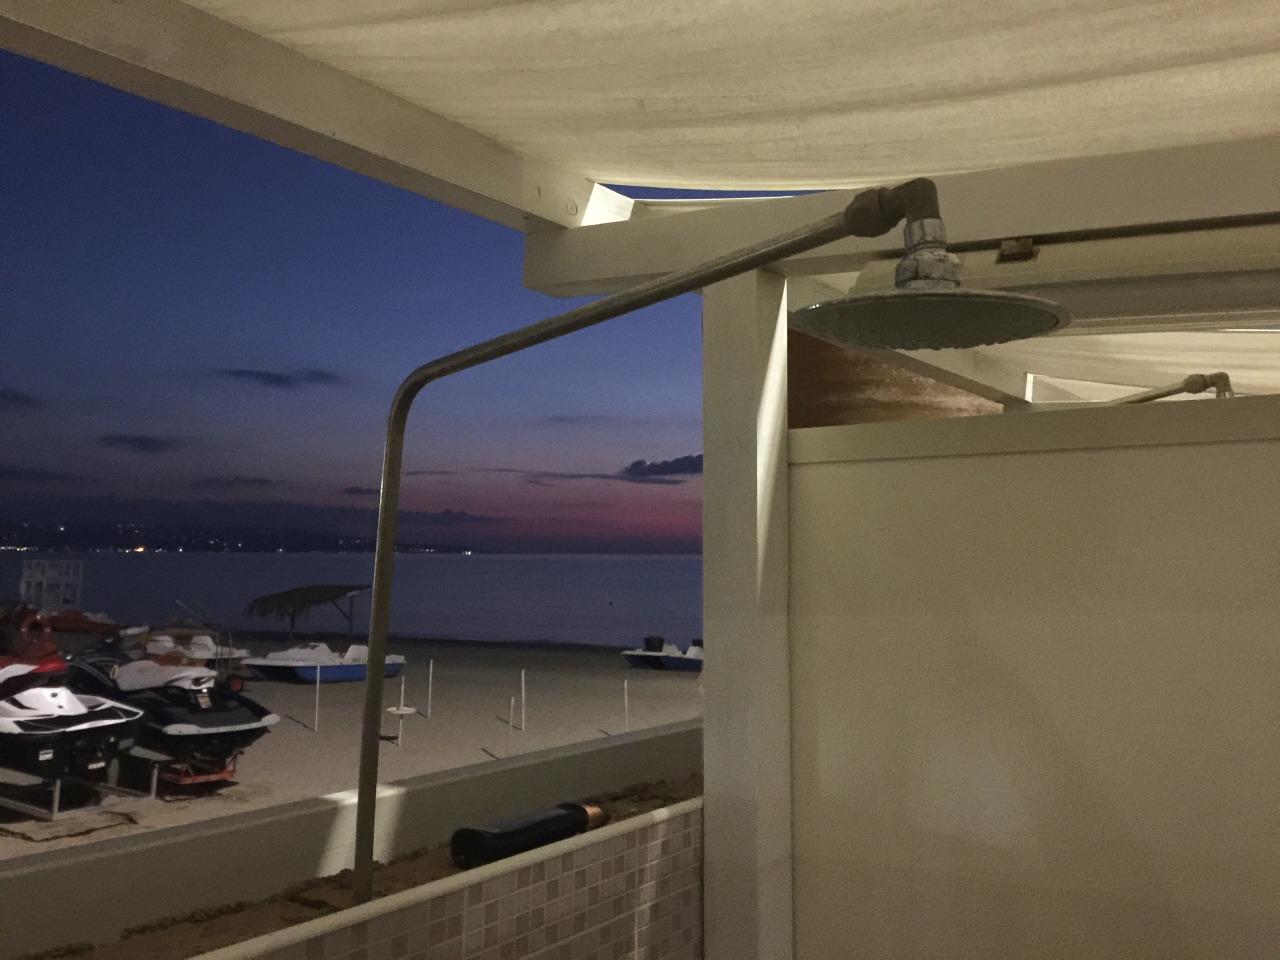 Day 10: San Ferdinando - Marinella